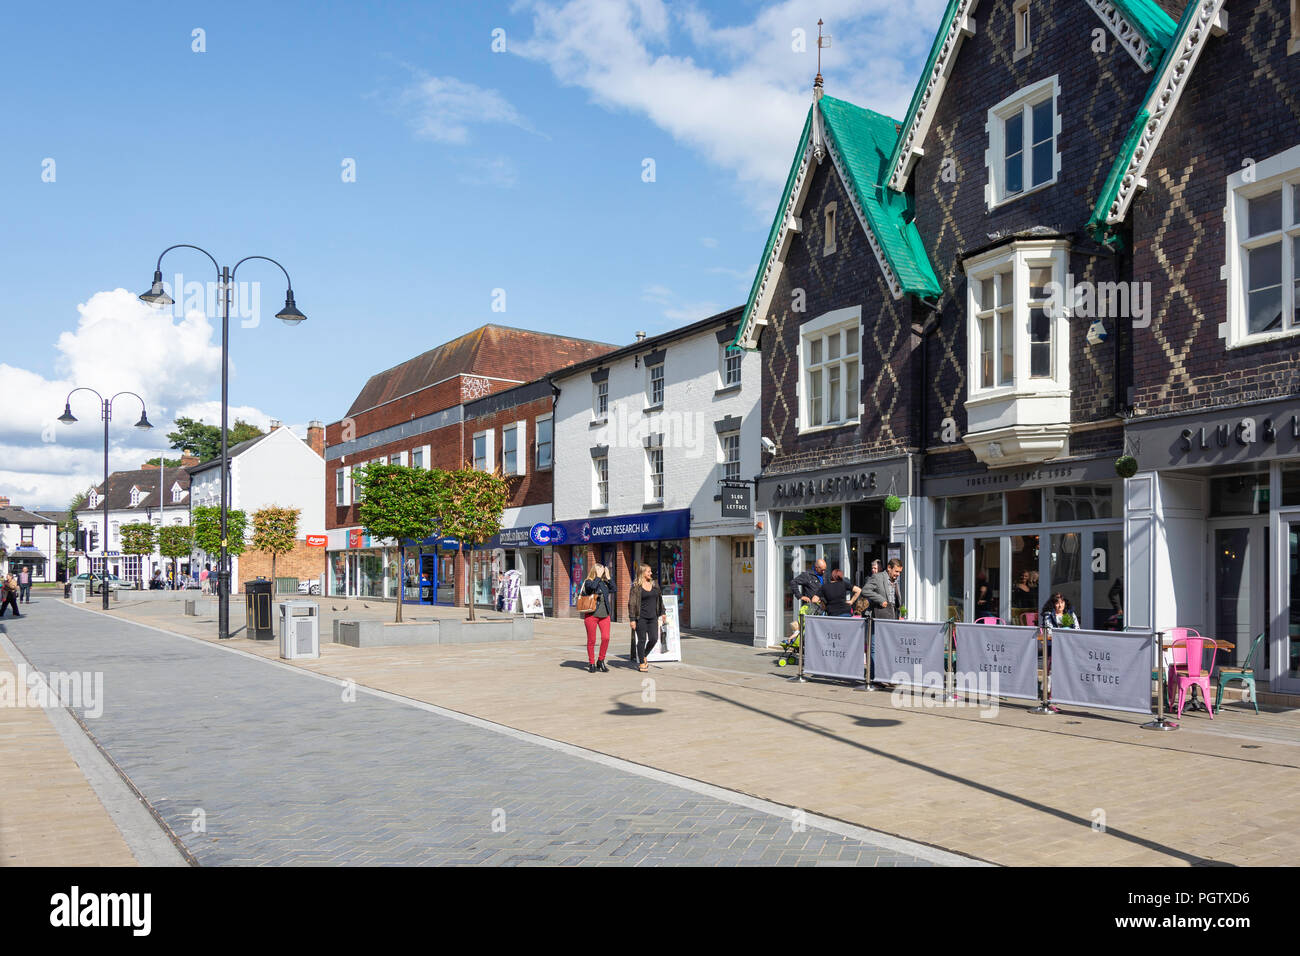 Pedestrianised High Street, Bromsgrove, Worcestershire, England, United Kingdom - Stock Image